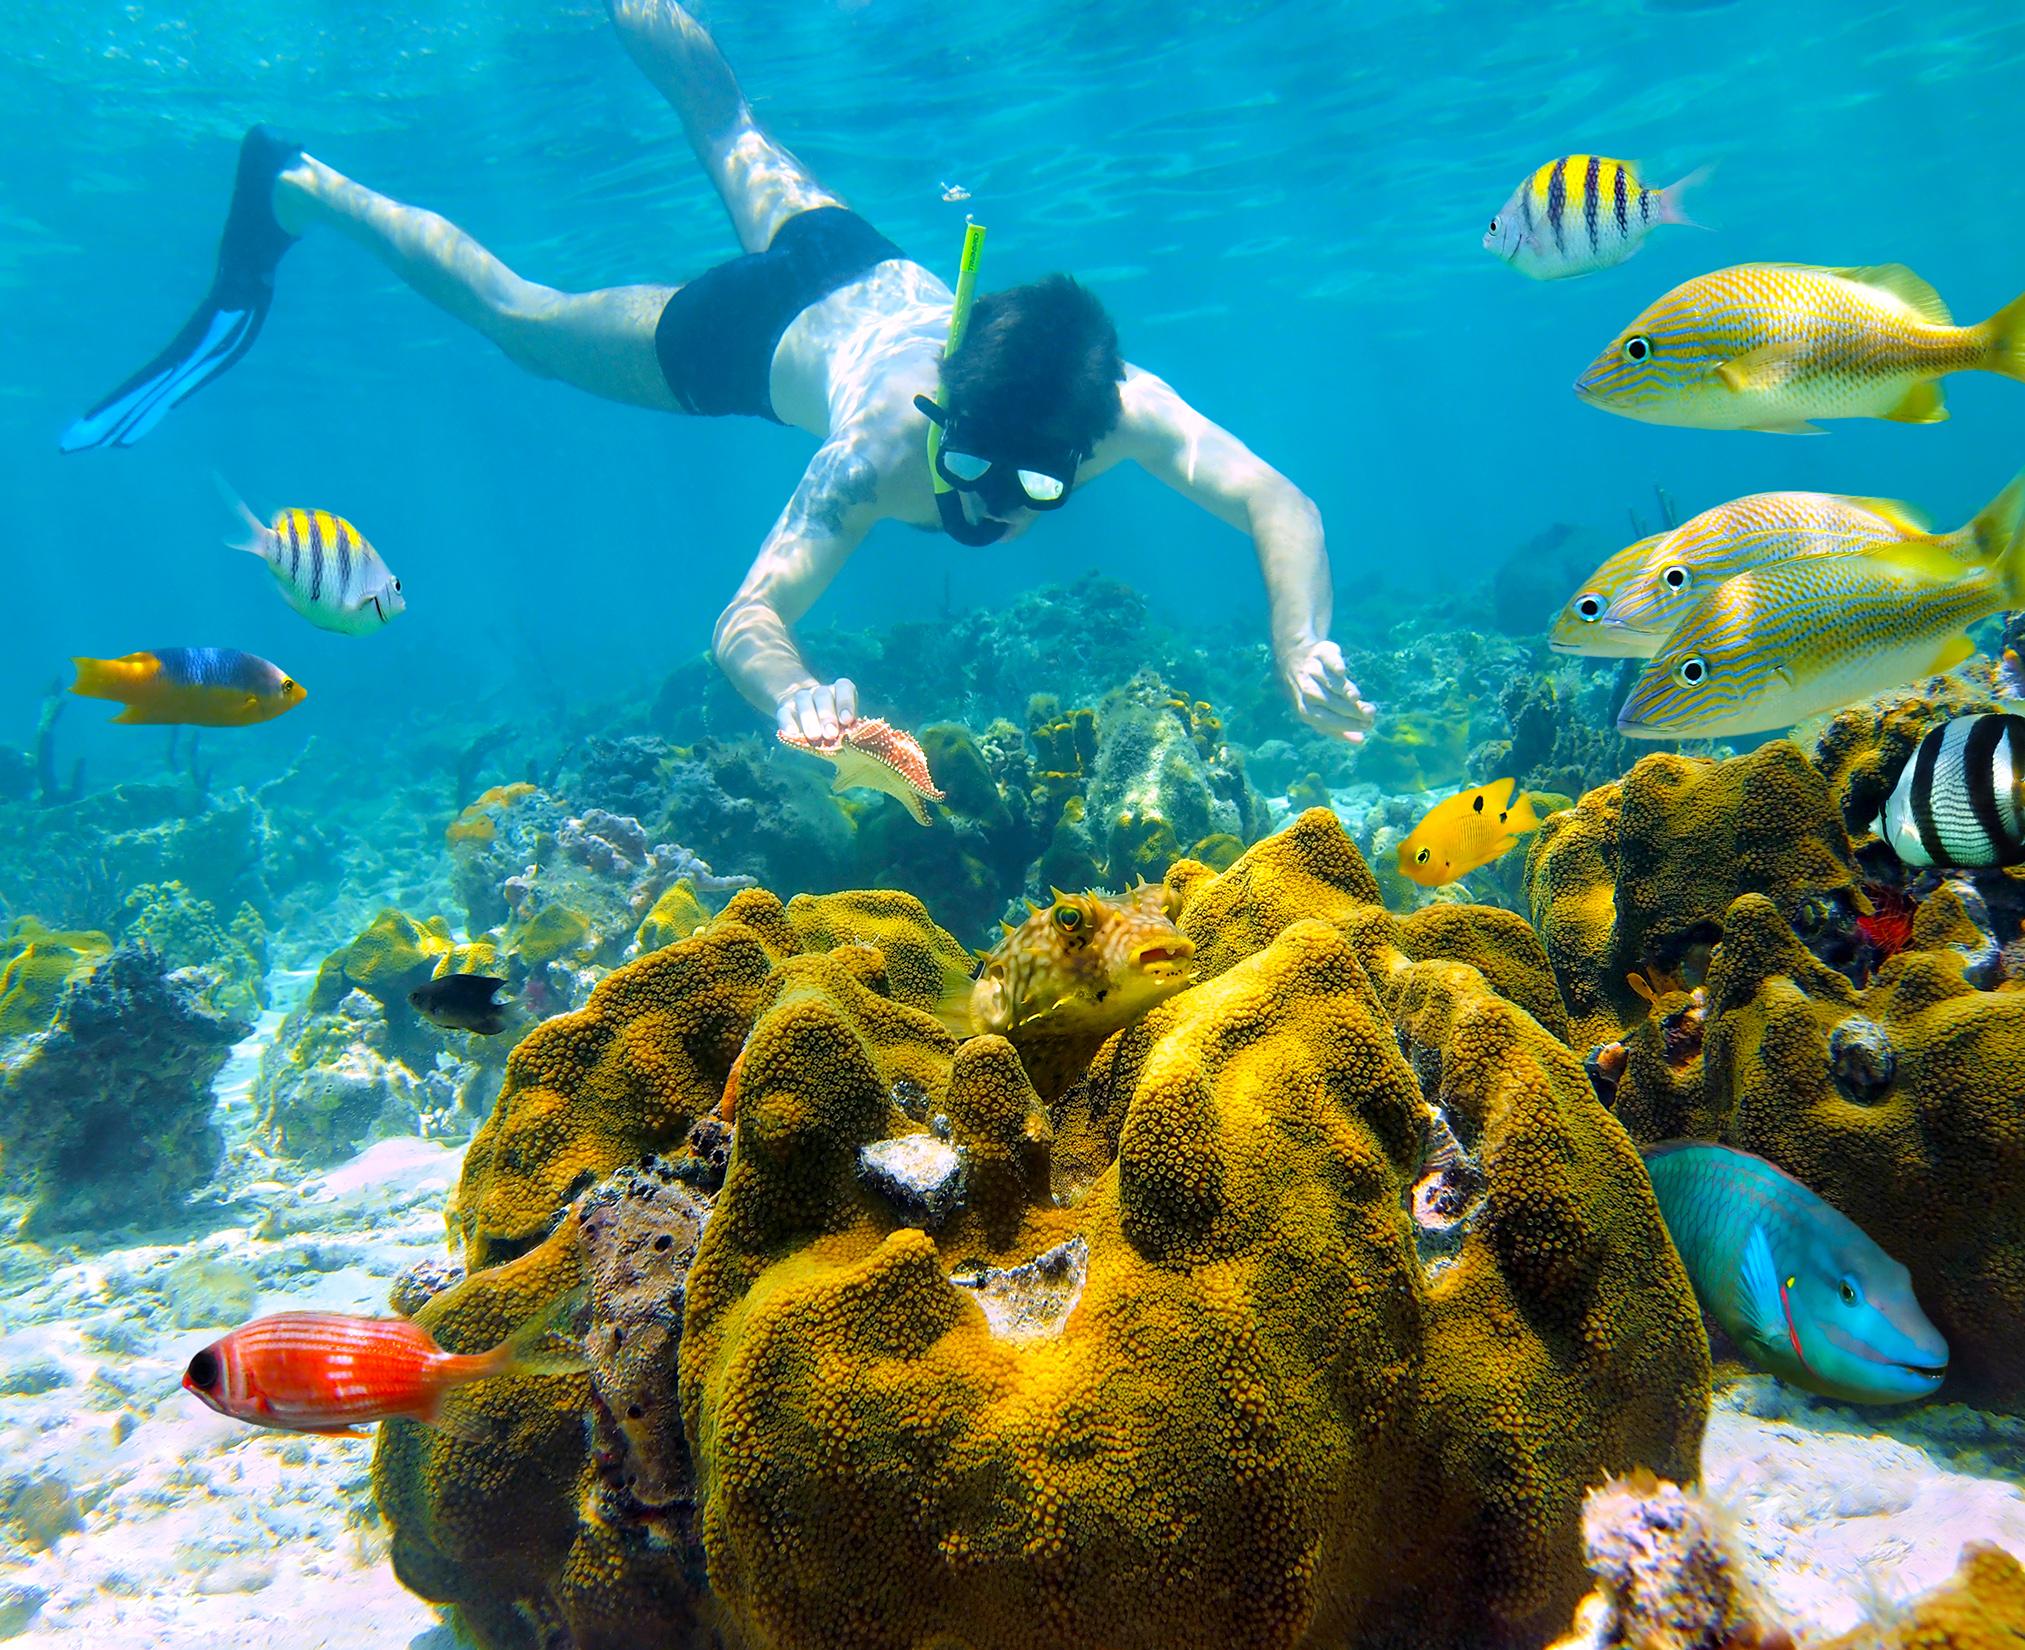 Snorkeling in the Virgin Islands